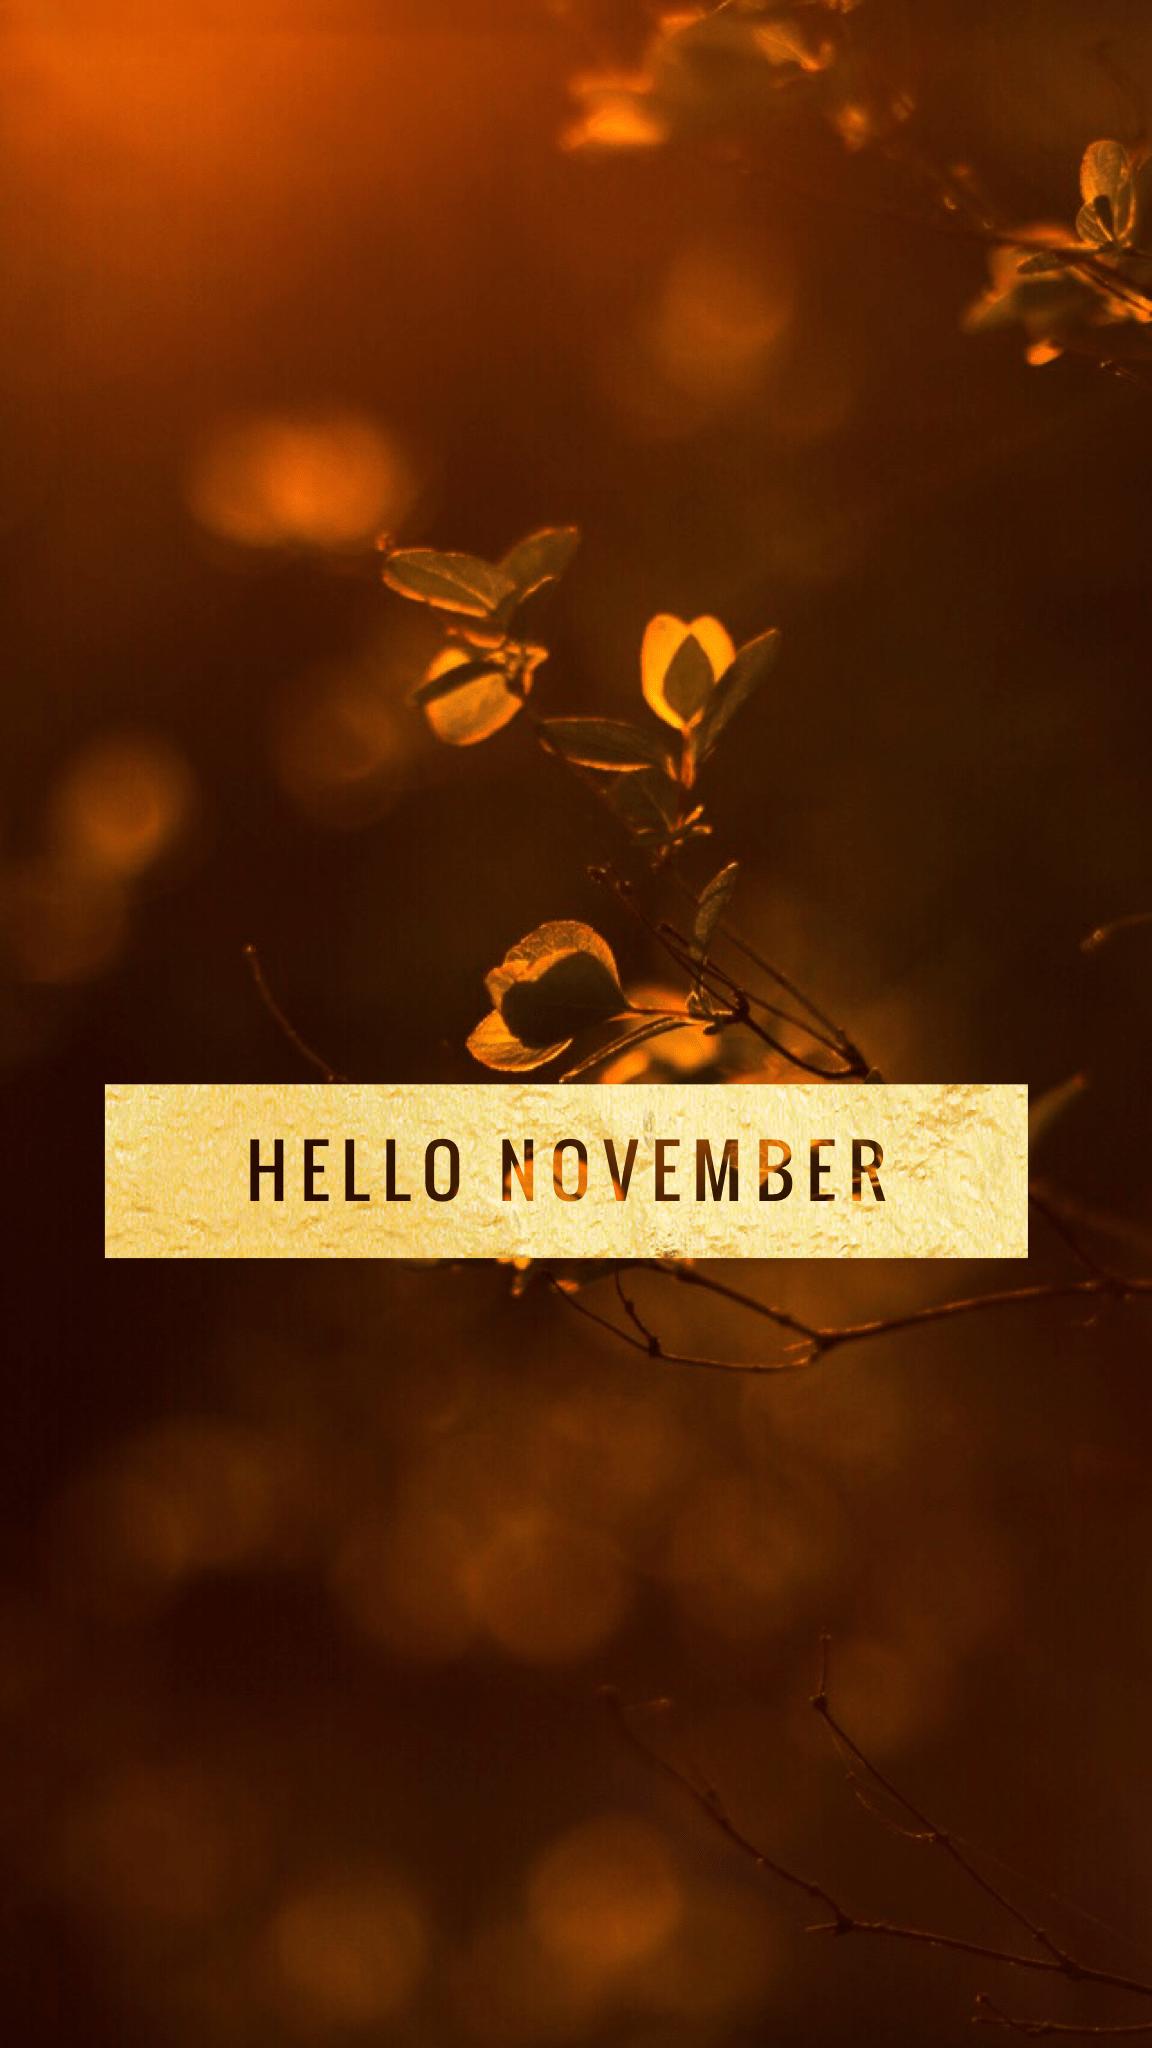 Hello November Iphone Wallpapers Top Free Hello November